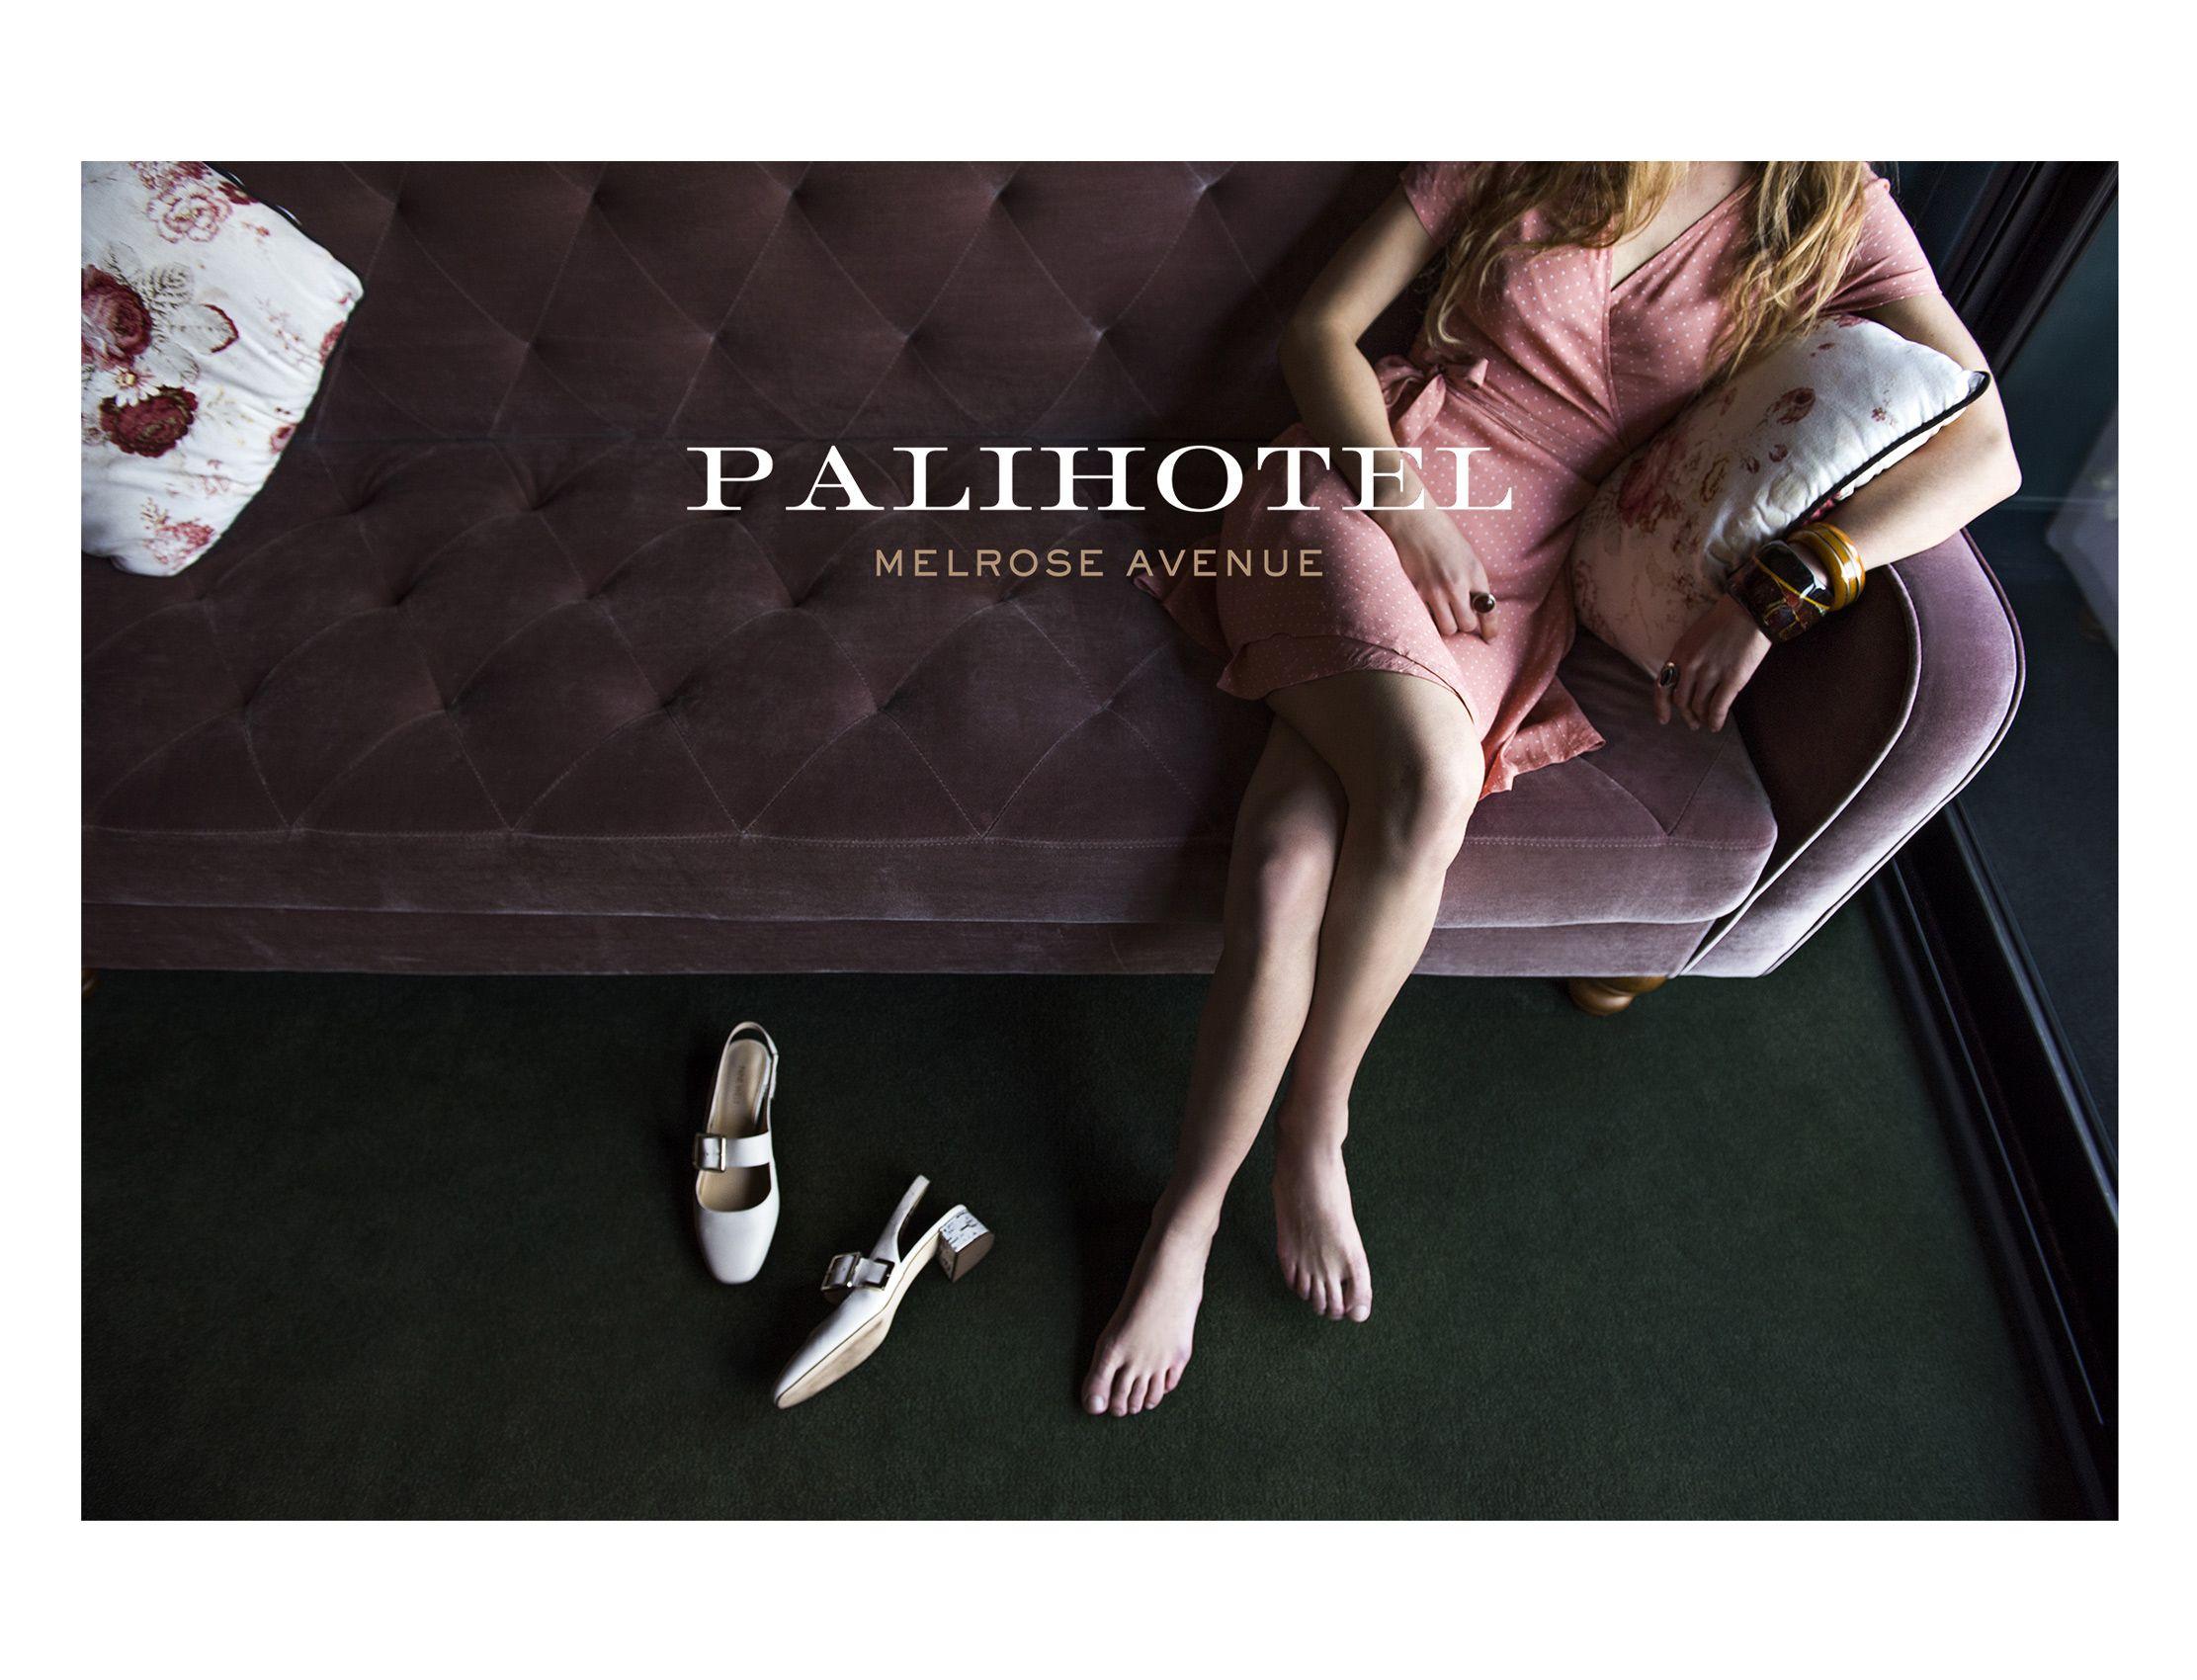 Palihotel_Mike-Carreiro-Photography_03.jpg